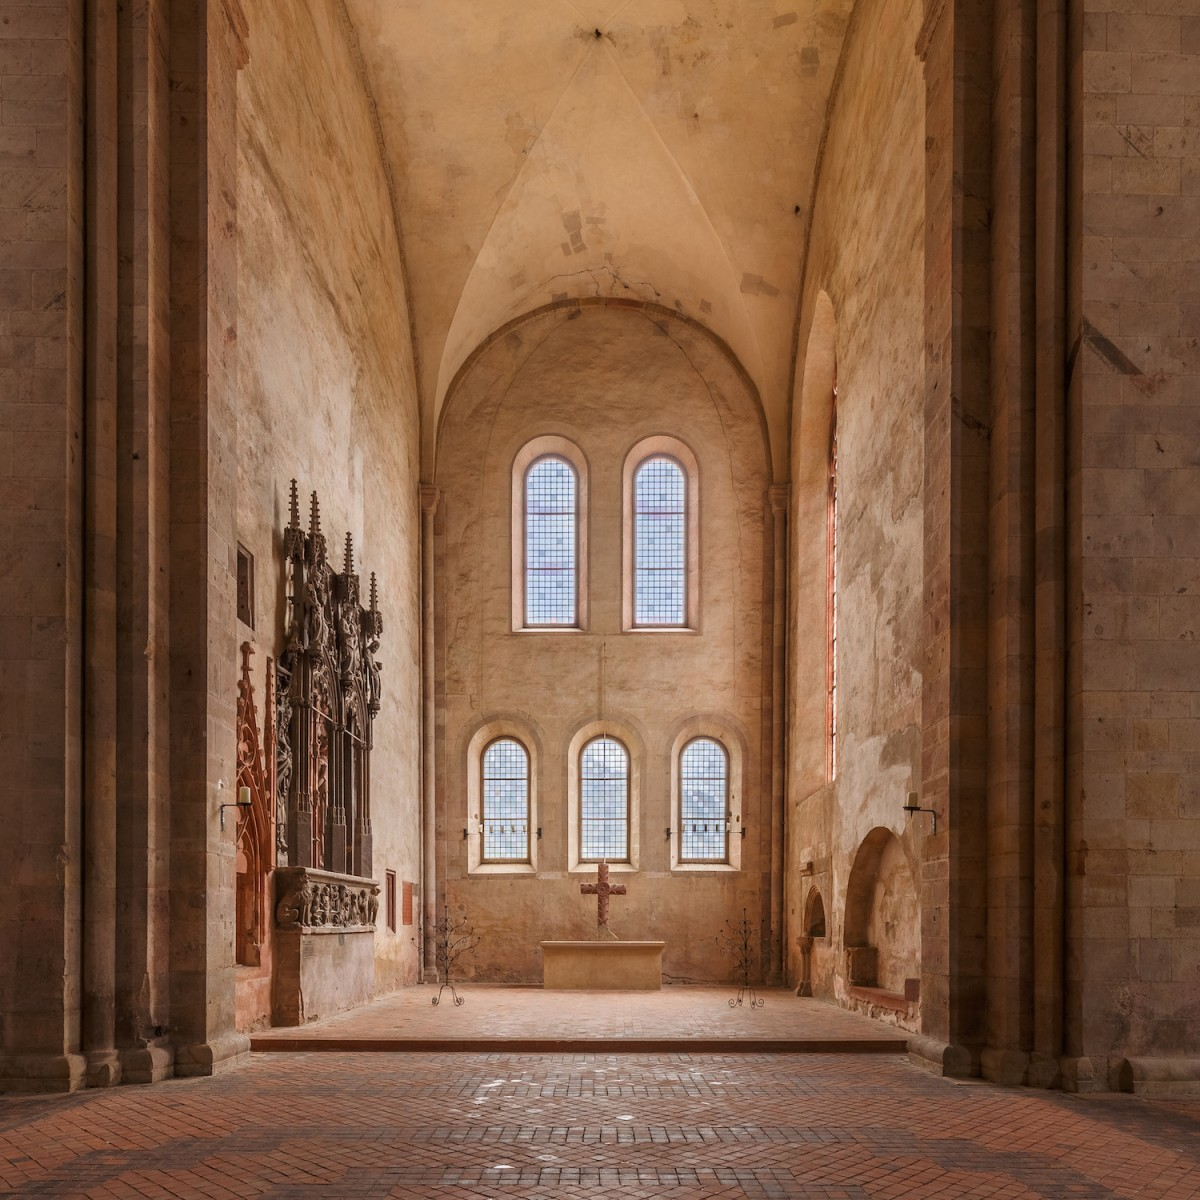 20190408-kloster-eberbach-c-michael-leukel-7